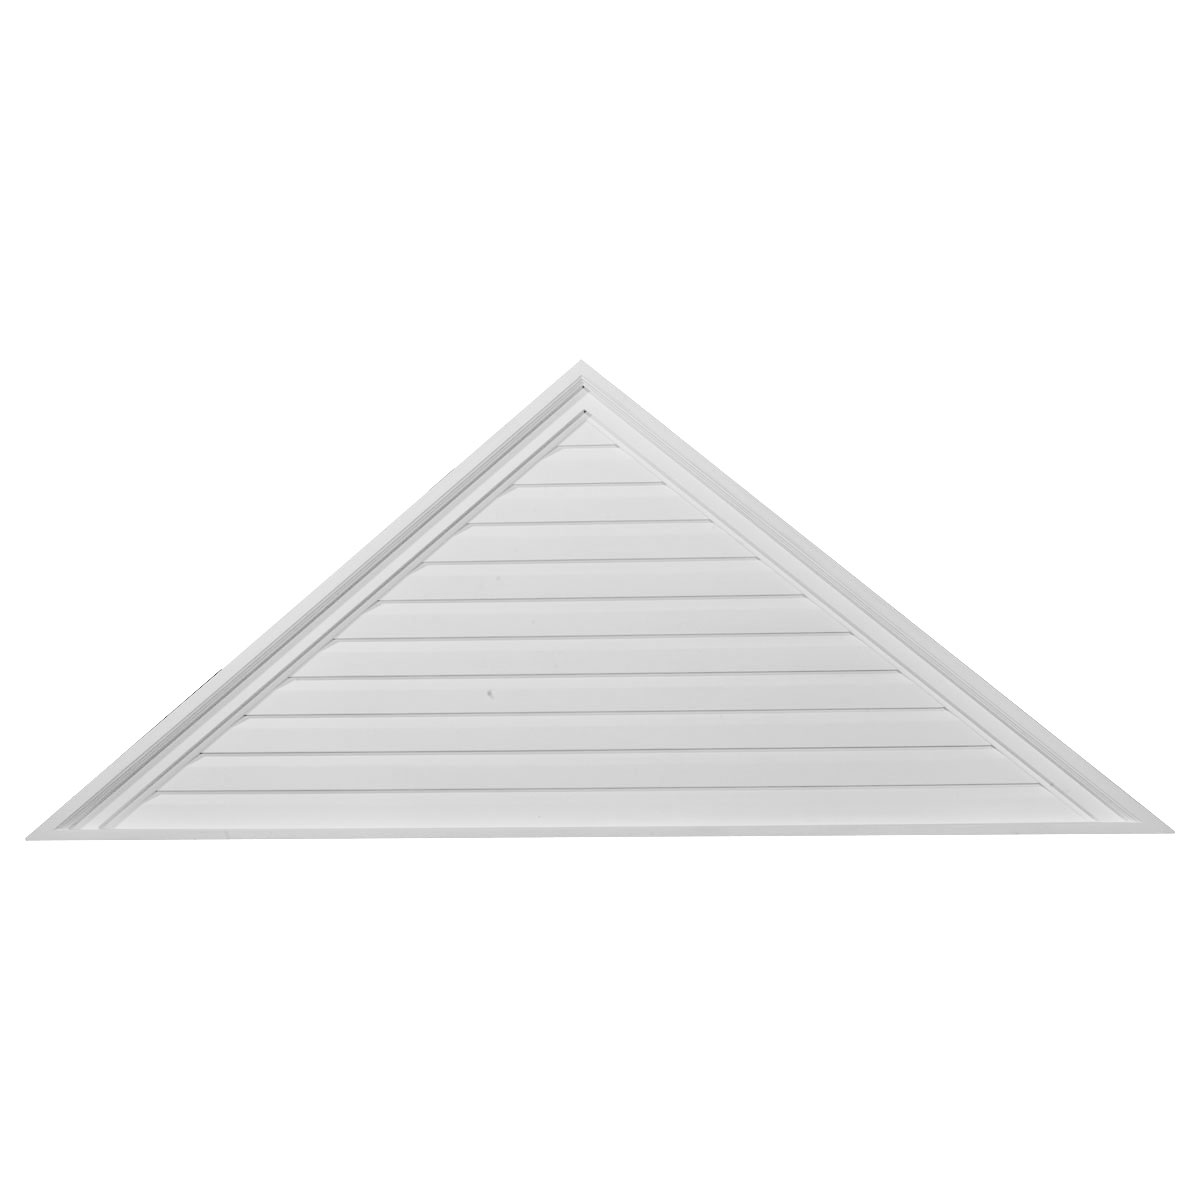 "em-gvtr72x21d - 72""w x 21""h x 2 1/4""p, pitch 7/12 triangle gable"